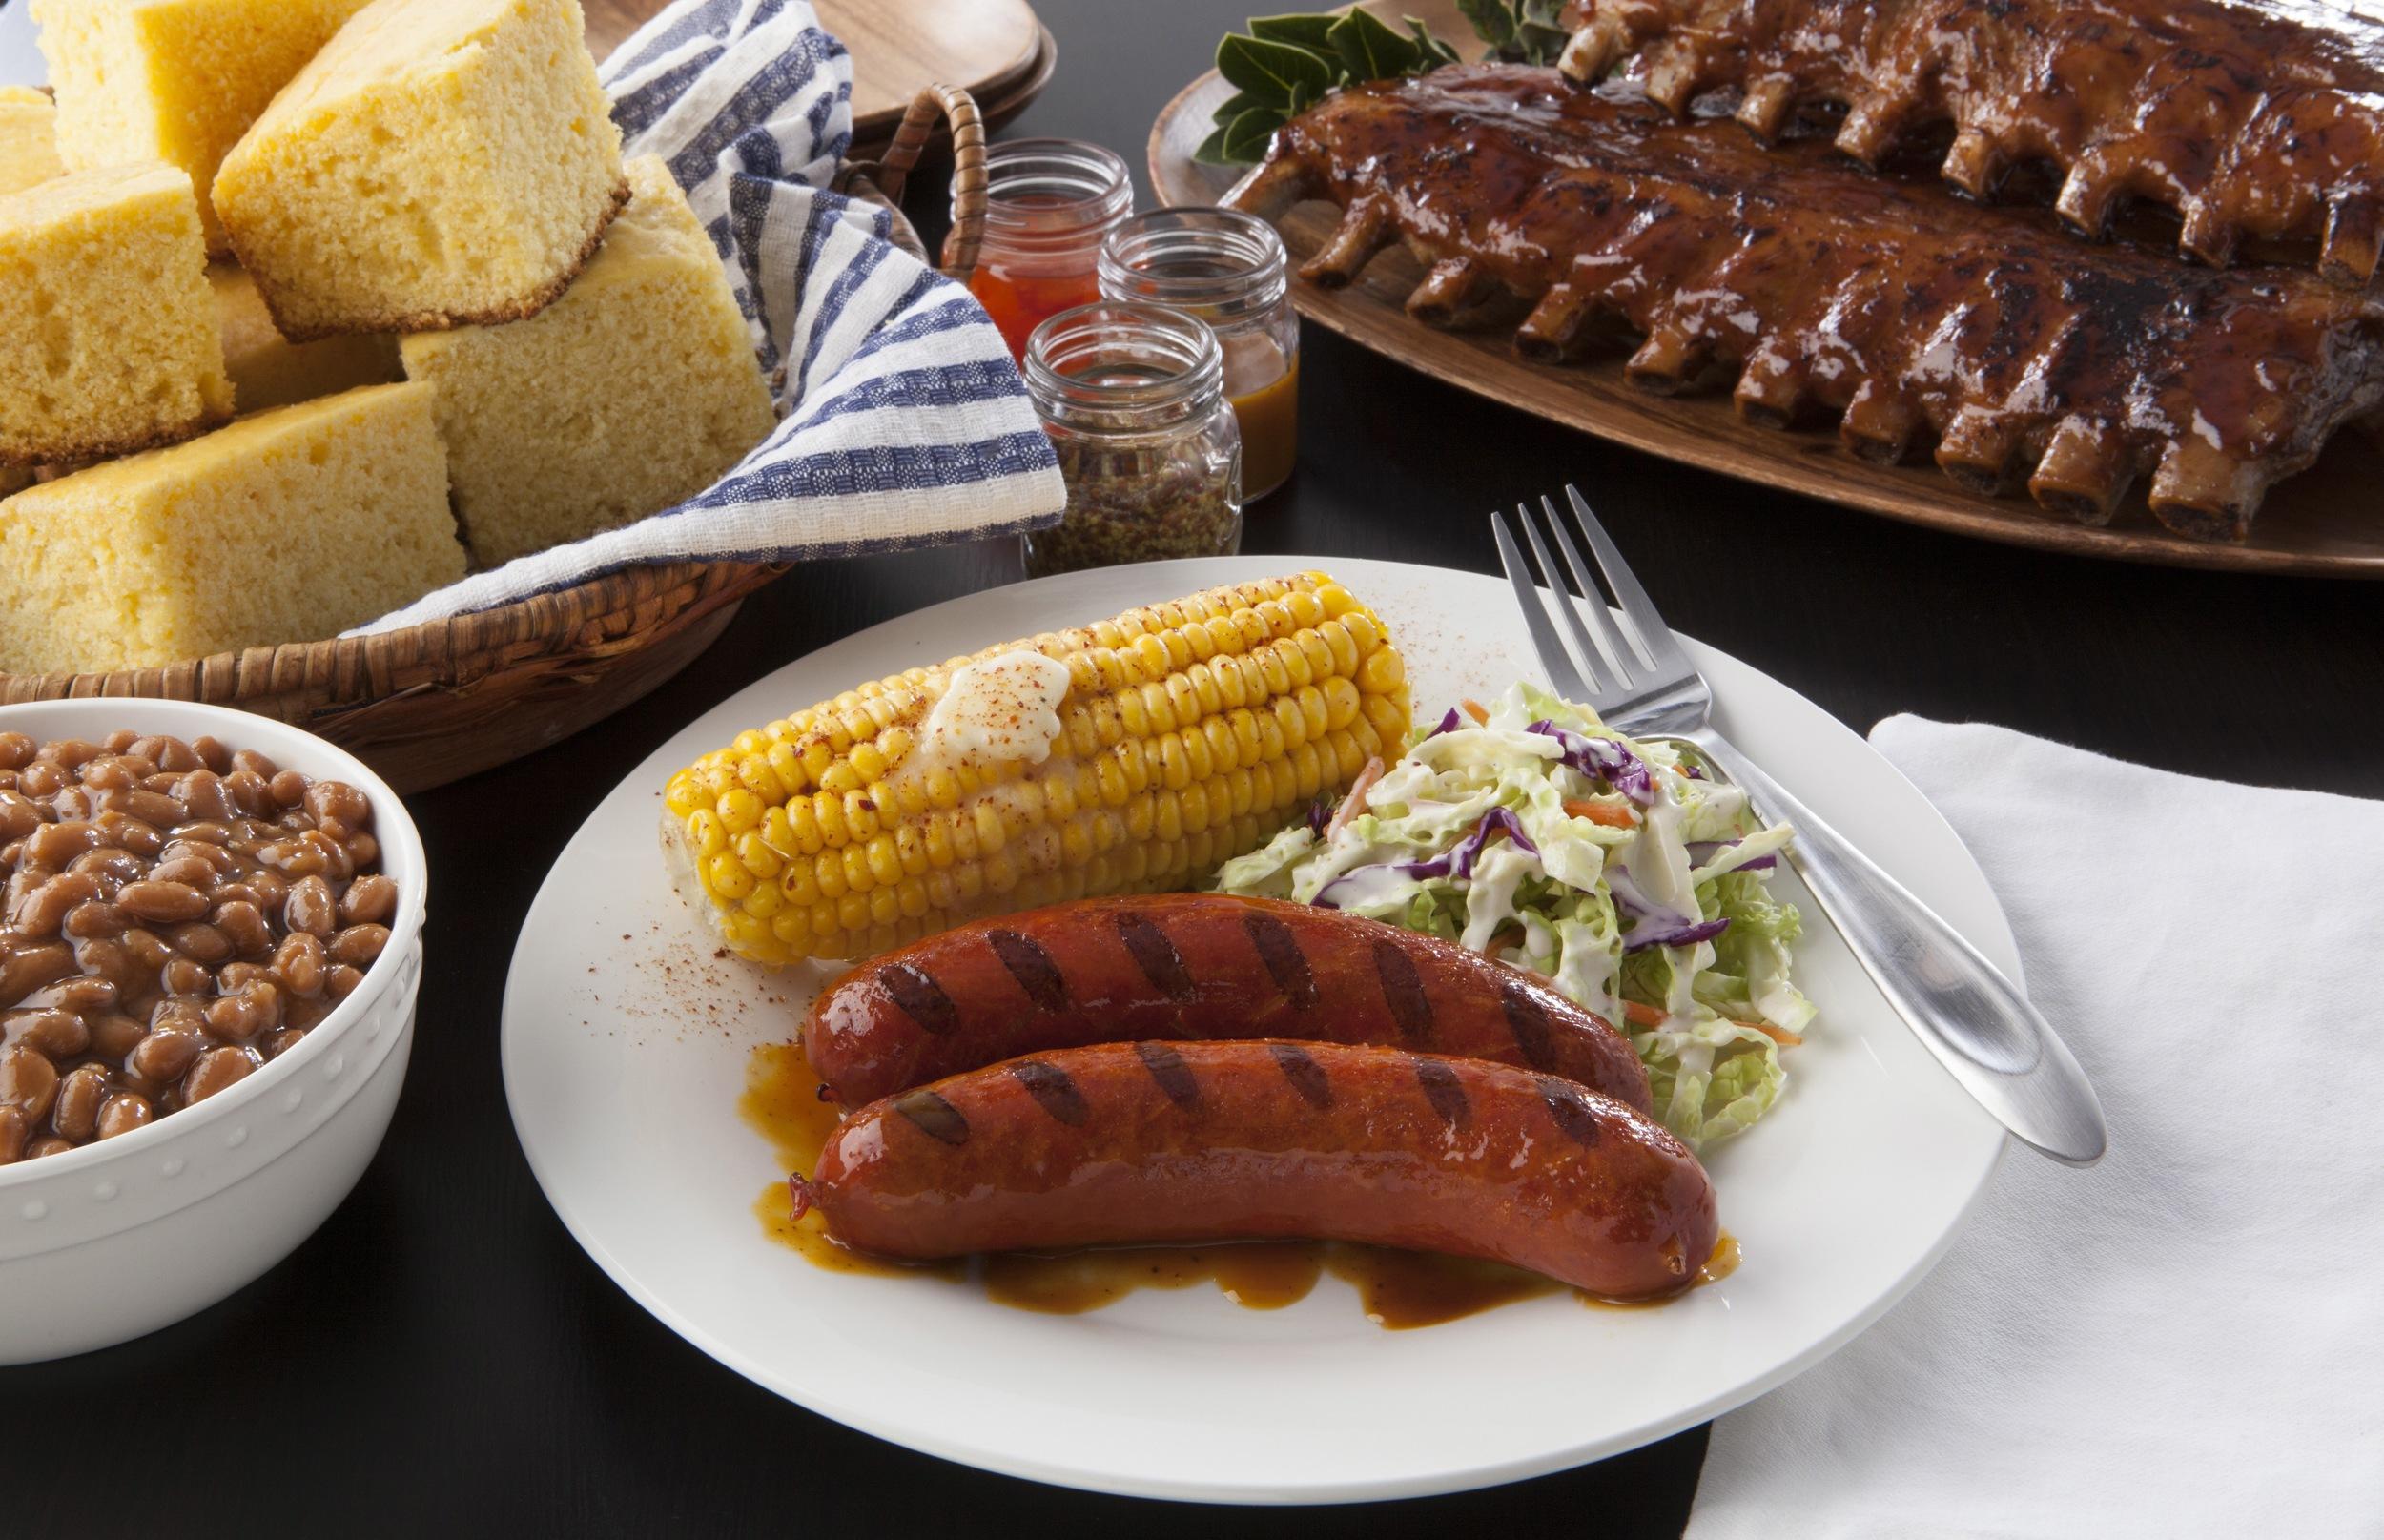 AAA Auto Insurance Commercial.  BBQ Louisiana Hot Links, Corn, Bushes Baked Beans, Cole Slaw, Corn Bread.